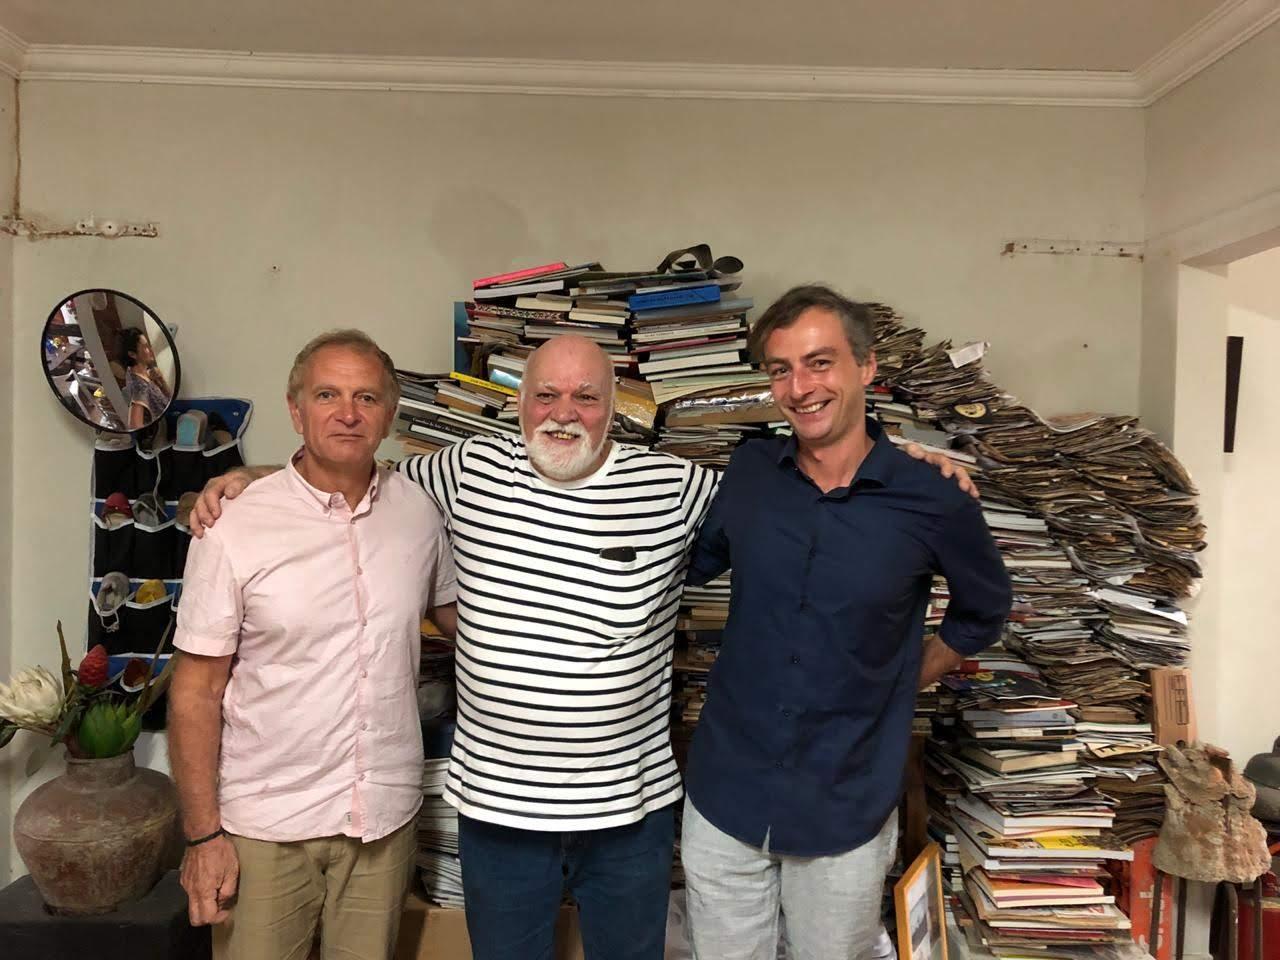 No atelier 2 - Curadoria franco-alemã realiza residência sobre Paulo Bruscky